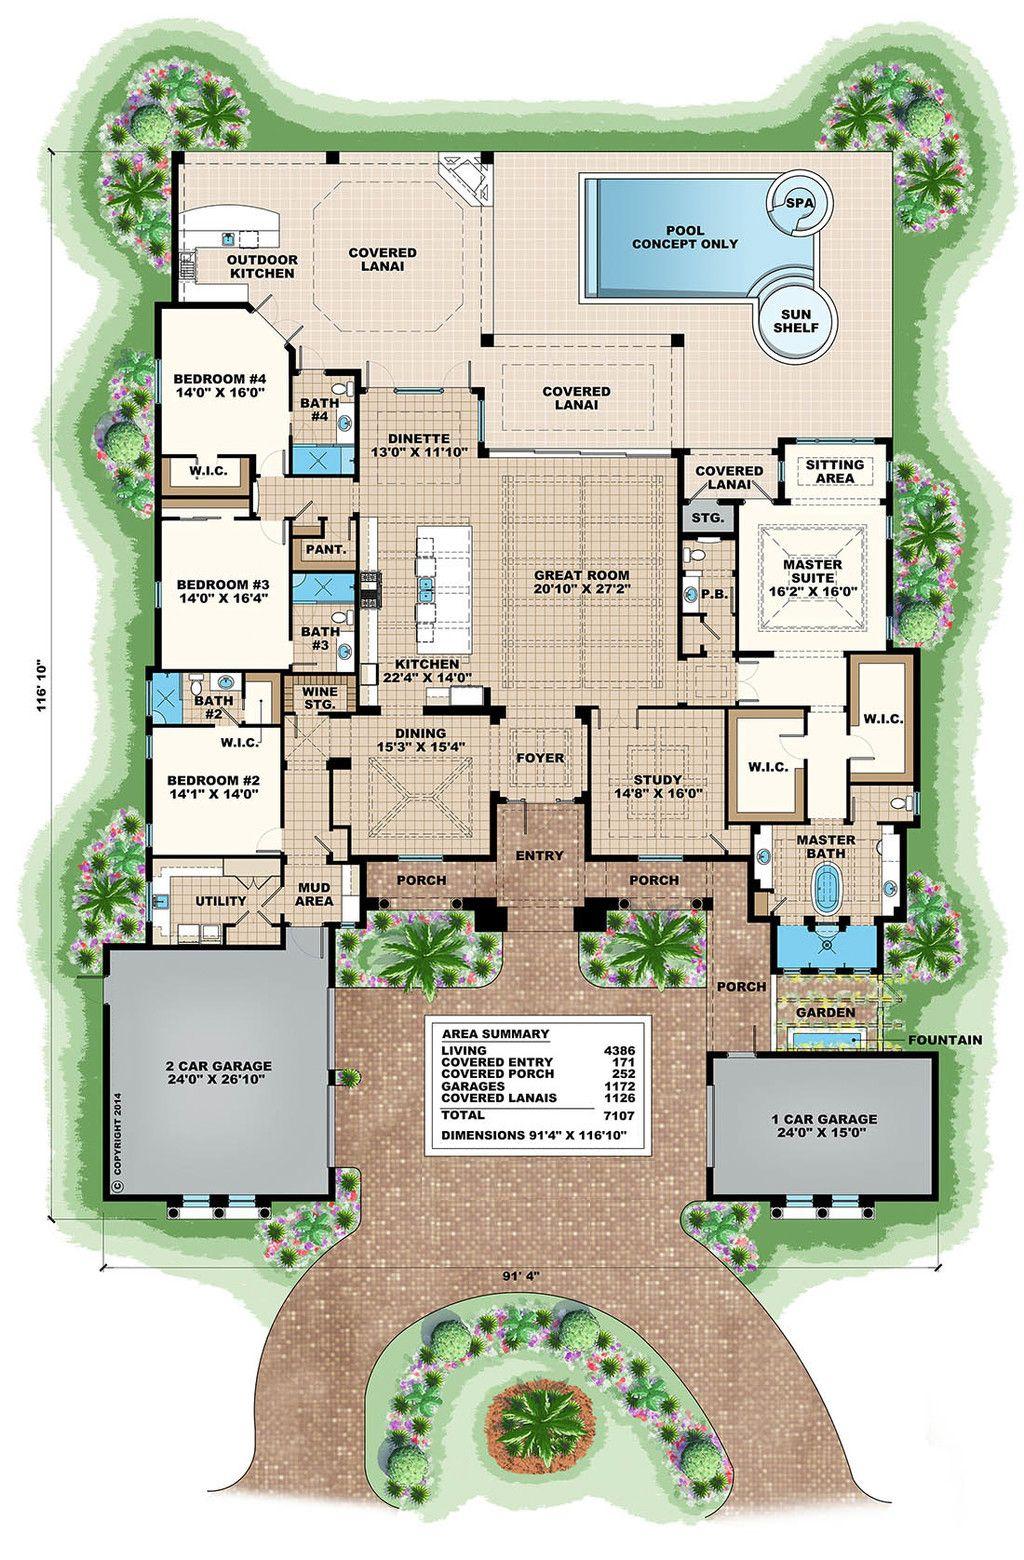 Mediterranean Style House Plan 4 Beds 4 5 Baths 4386 Sq Ft Plan 27 502 Mediterranean Style House Plans Mediterranean Floor Plans Mediterranean House Plan